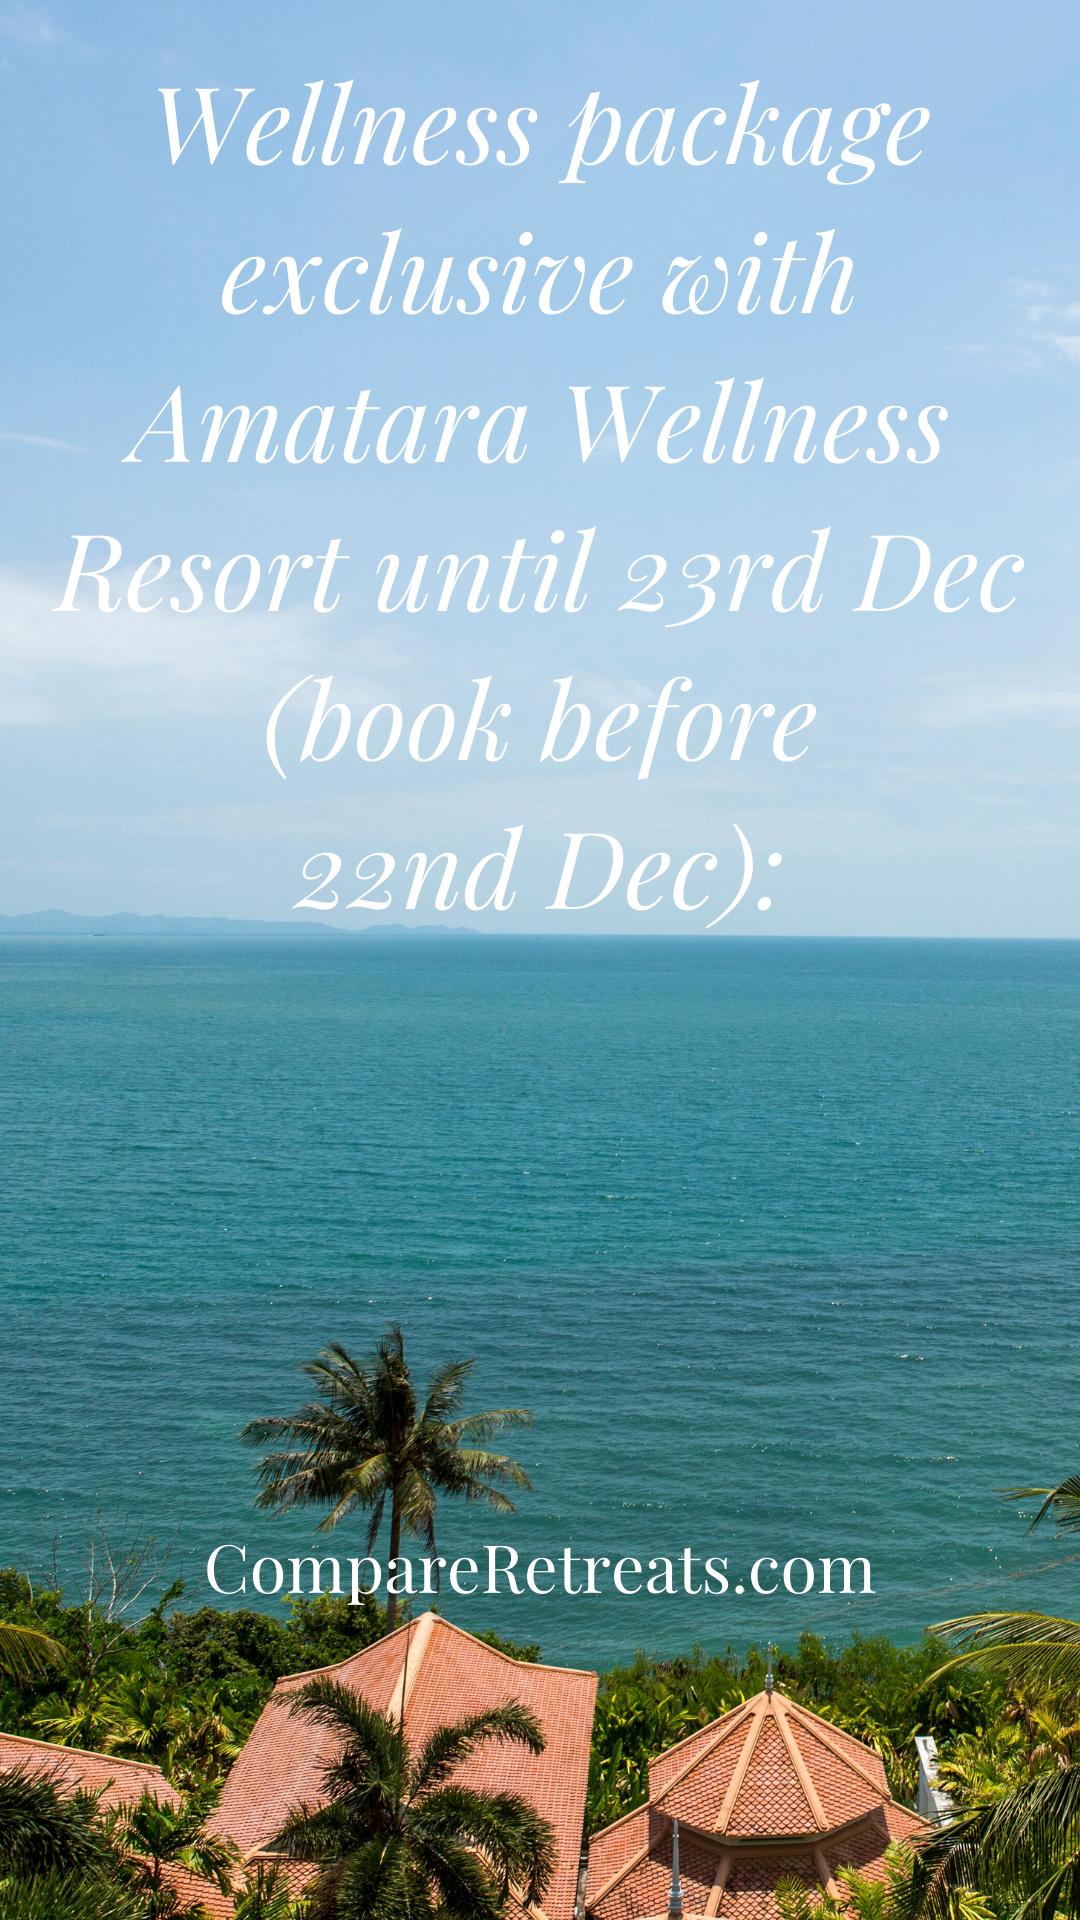 Wellness Package Exclusive With Amatara Wellness Resort Until 23rd Dec Book Before 22nd Dec Wellness Resort Resort England Travel